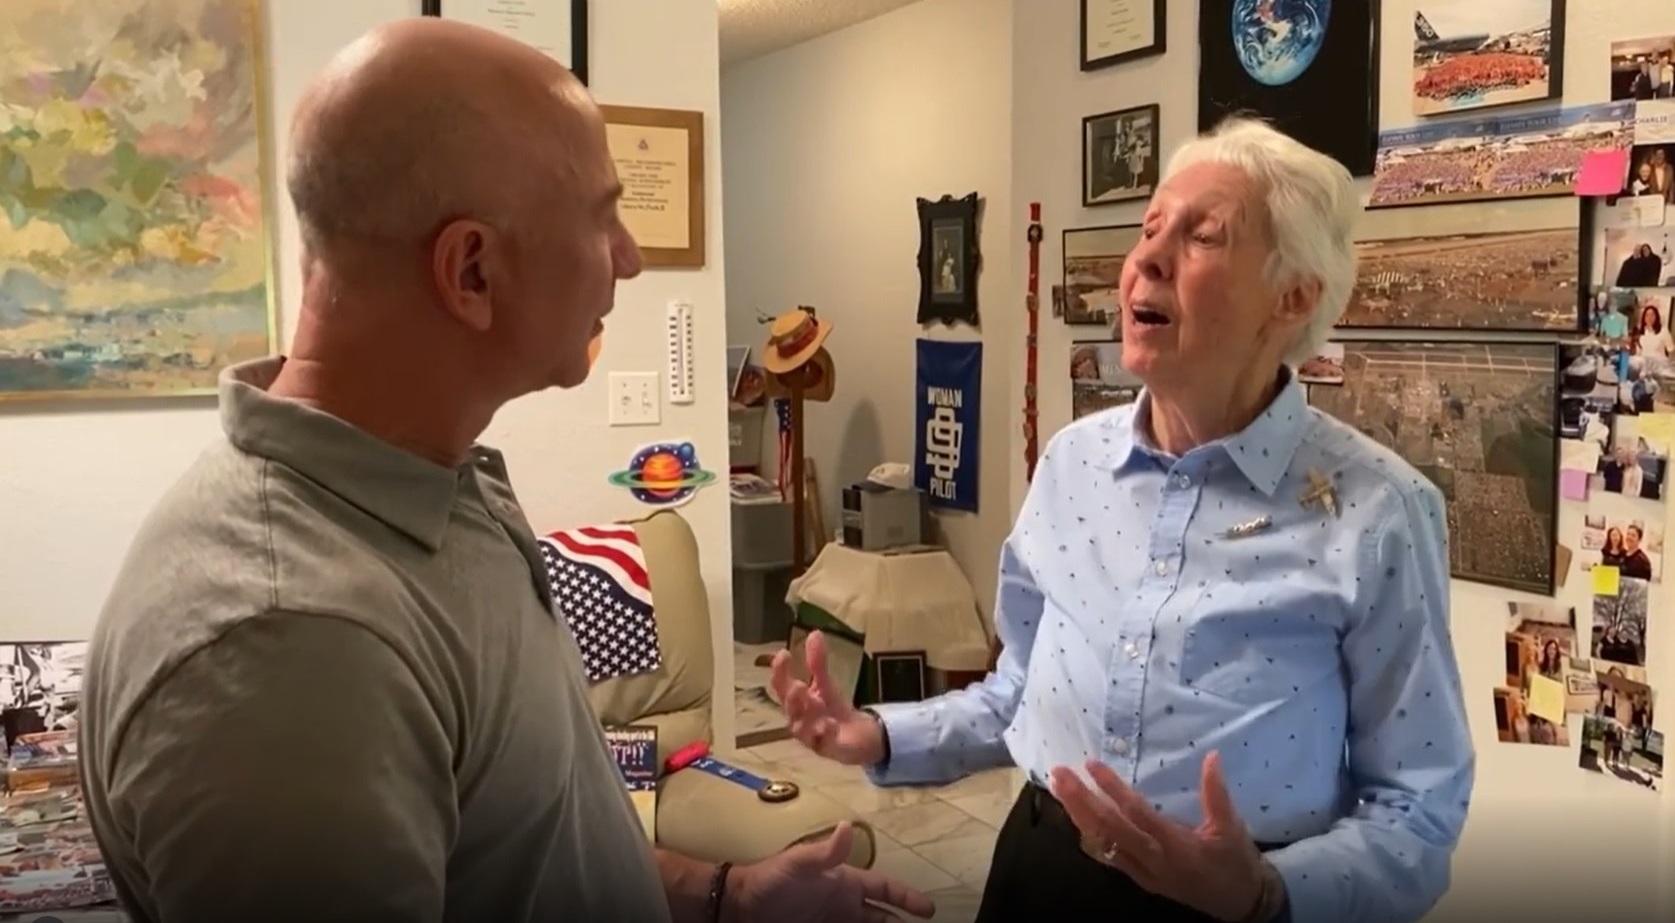 'Mercury 13' woman aviator Wally Funk will ride with Jeff Bezos on Blue Origin suborbital space trip